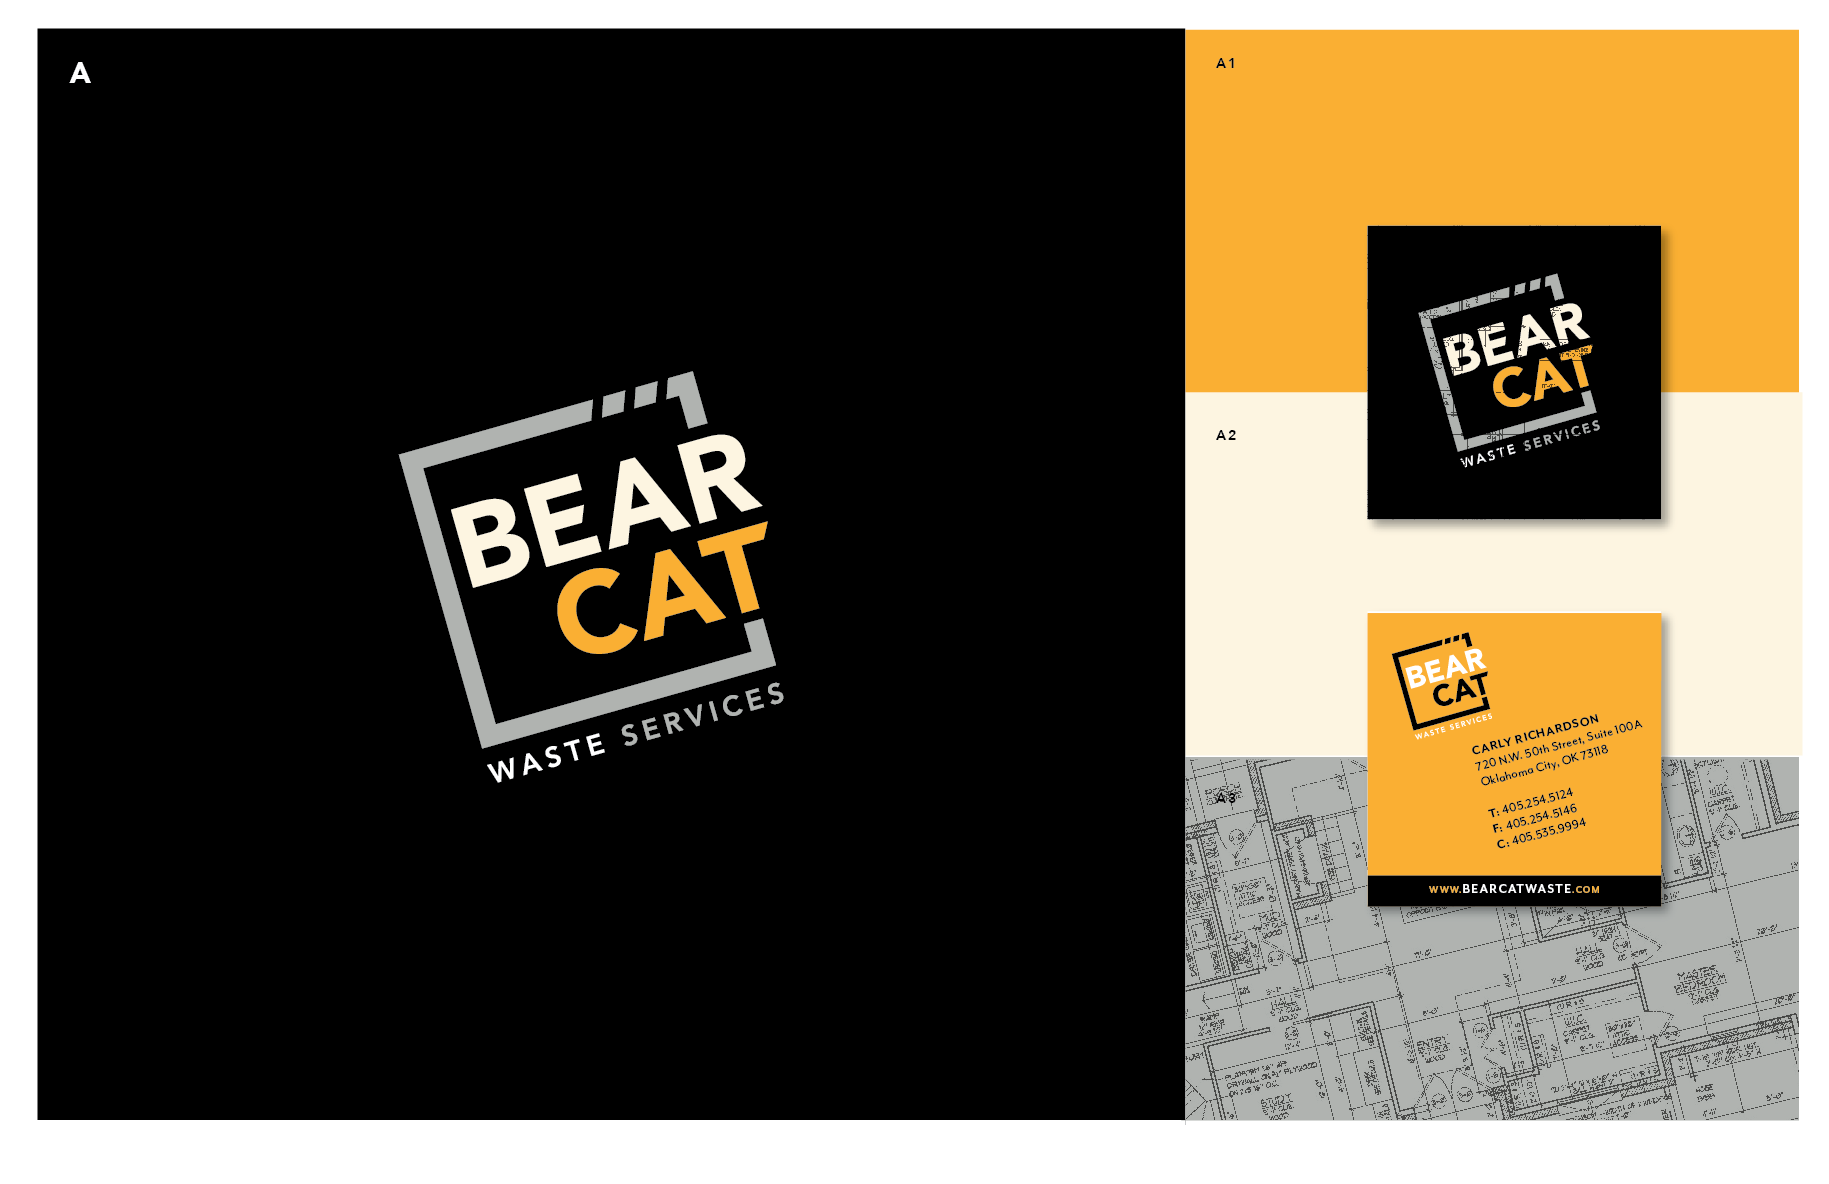 Bearcat-logo-presentation-layout-A-round1.png